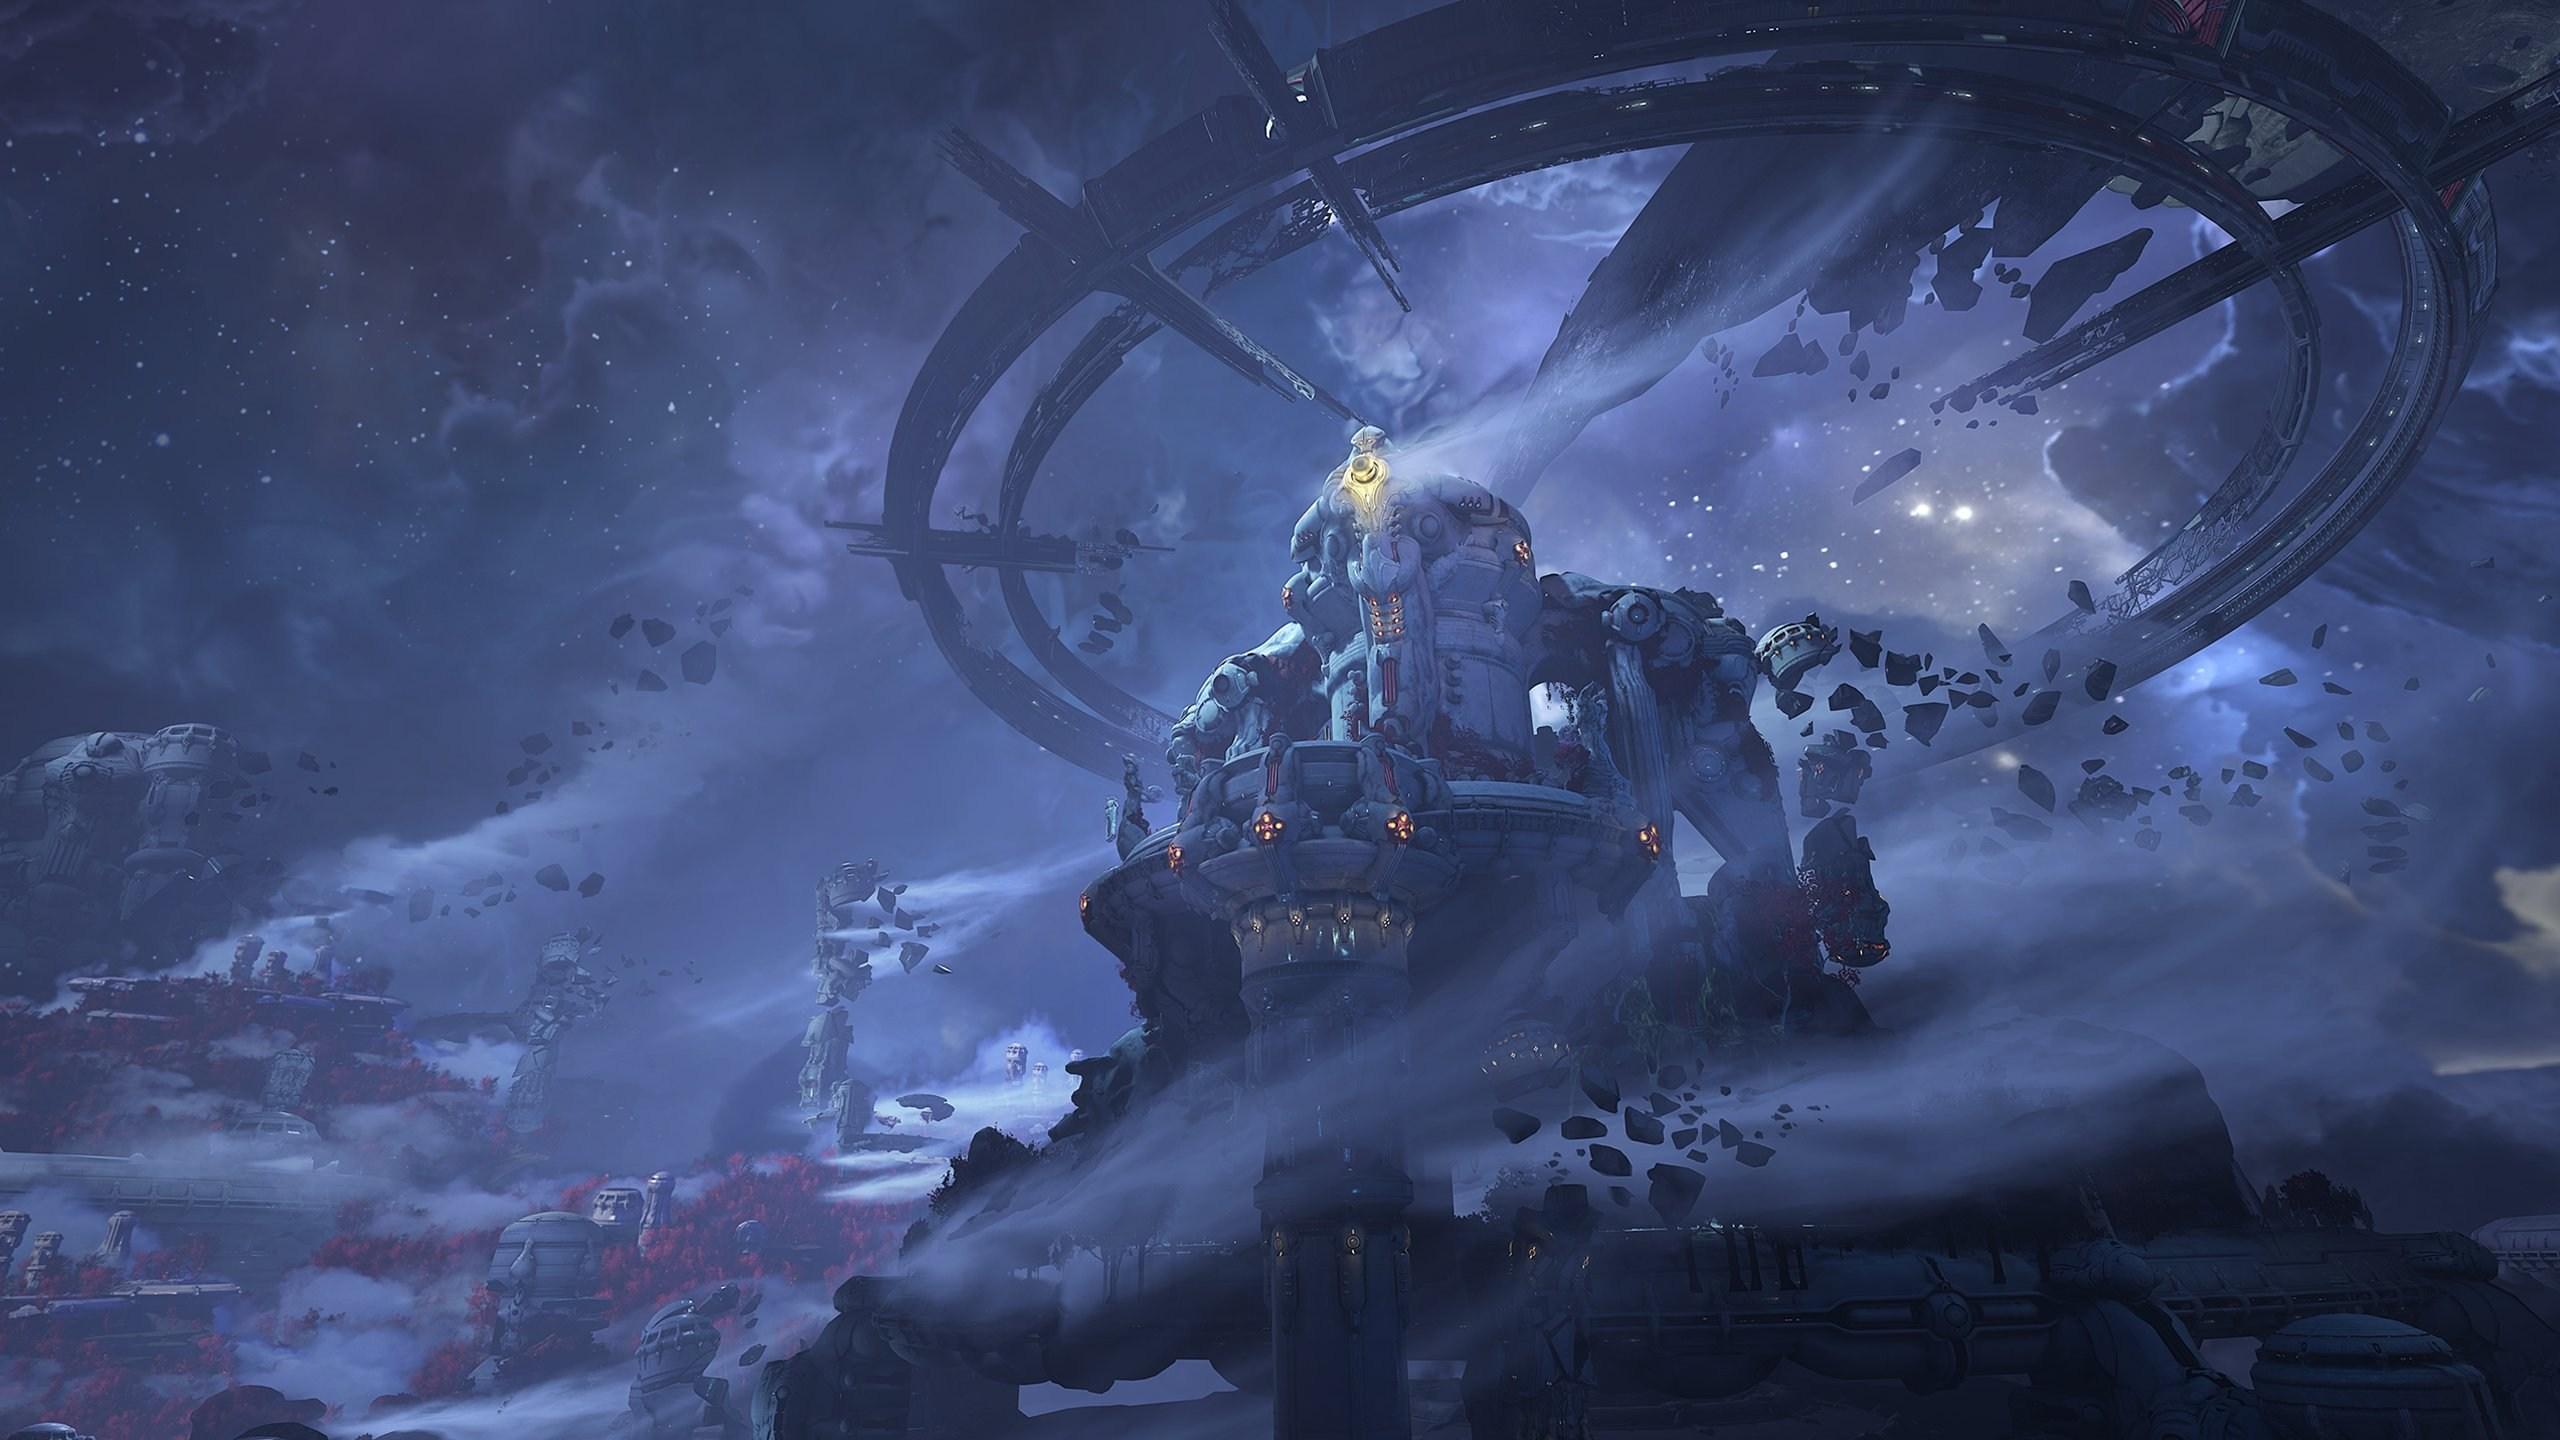 First Doom Eternal DLC screenshots look suitably epic